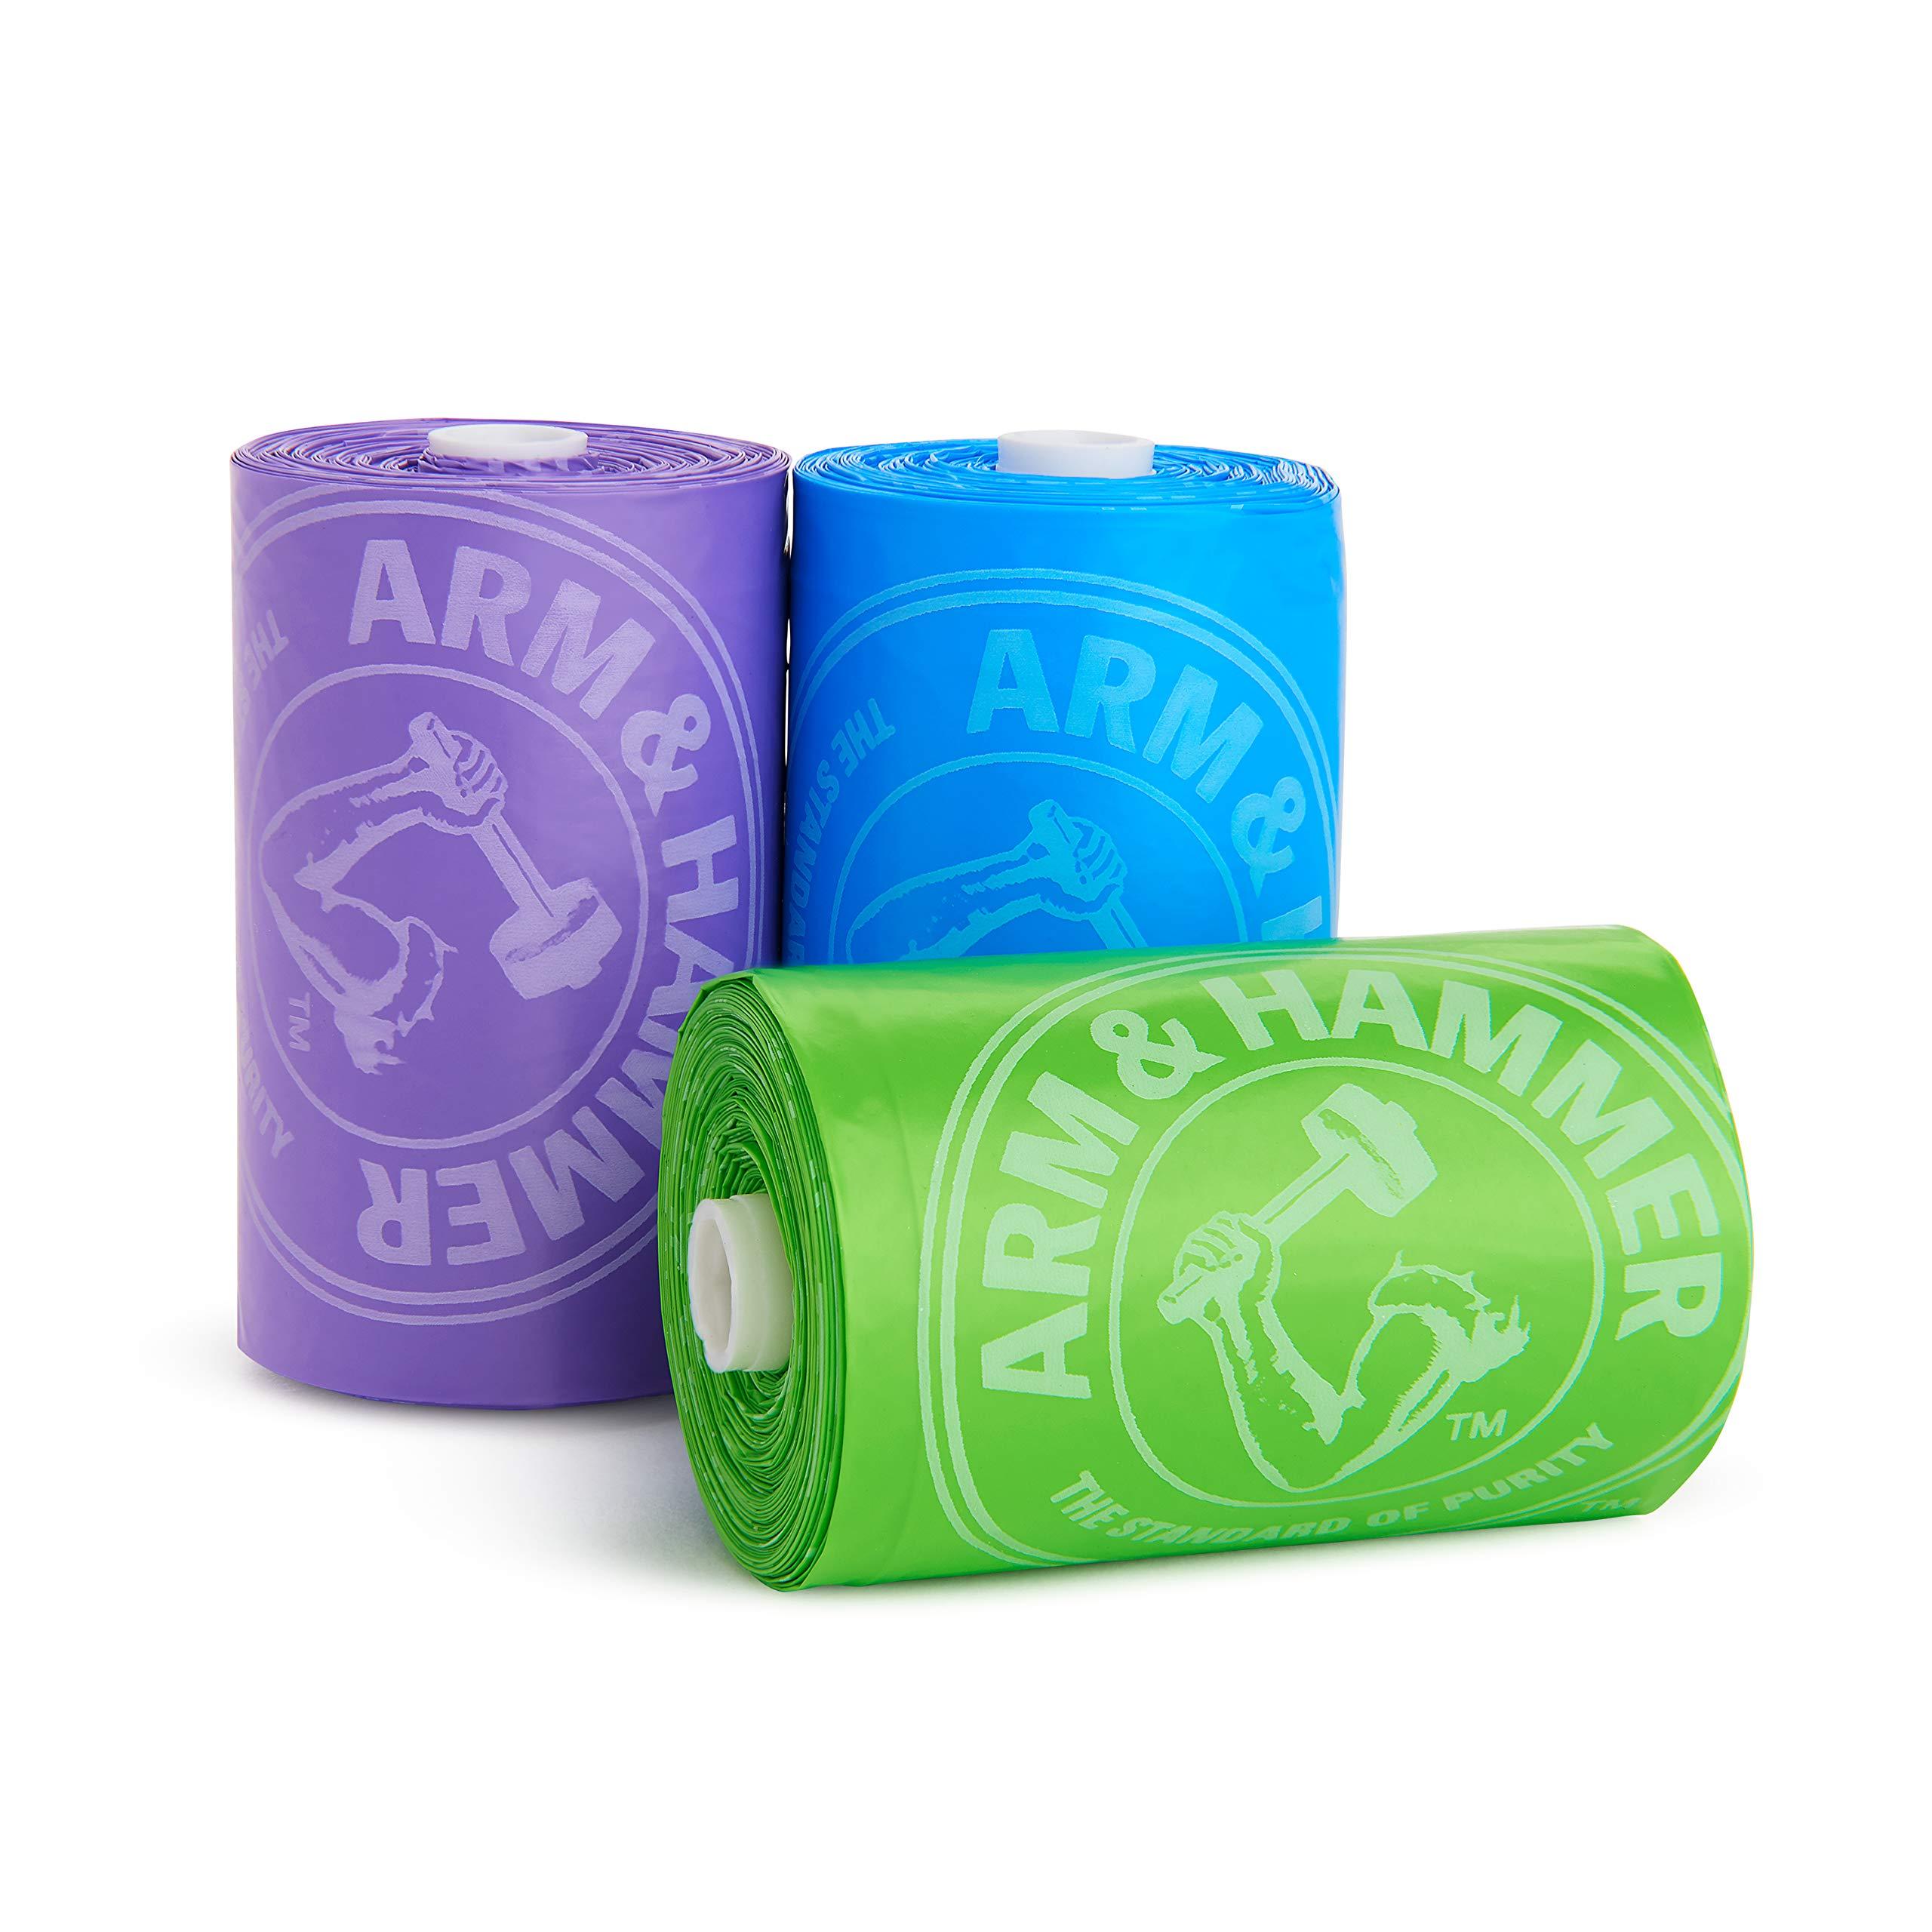 c56b6e19bbe5 Amazon.com   Munchkin Arm   Hammer Diaper Bag Dispenser with Bags ...